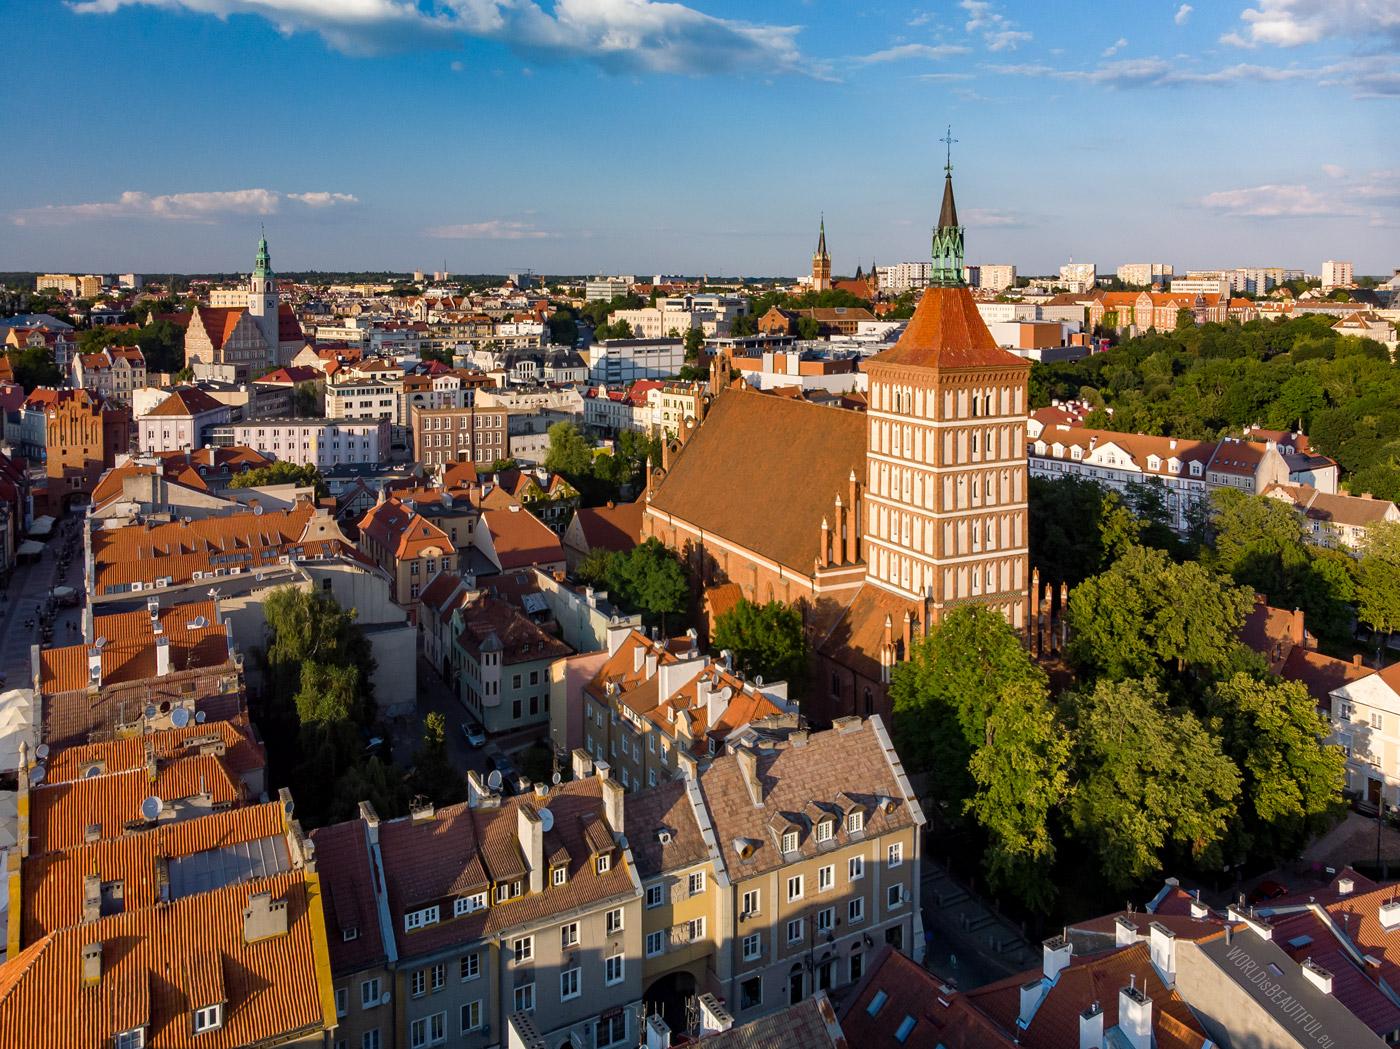 Olsztyn - panorama of the city